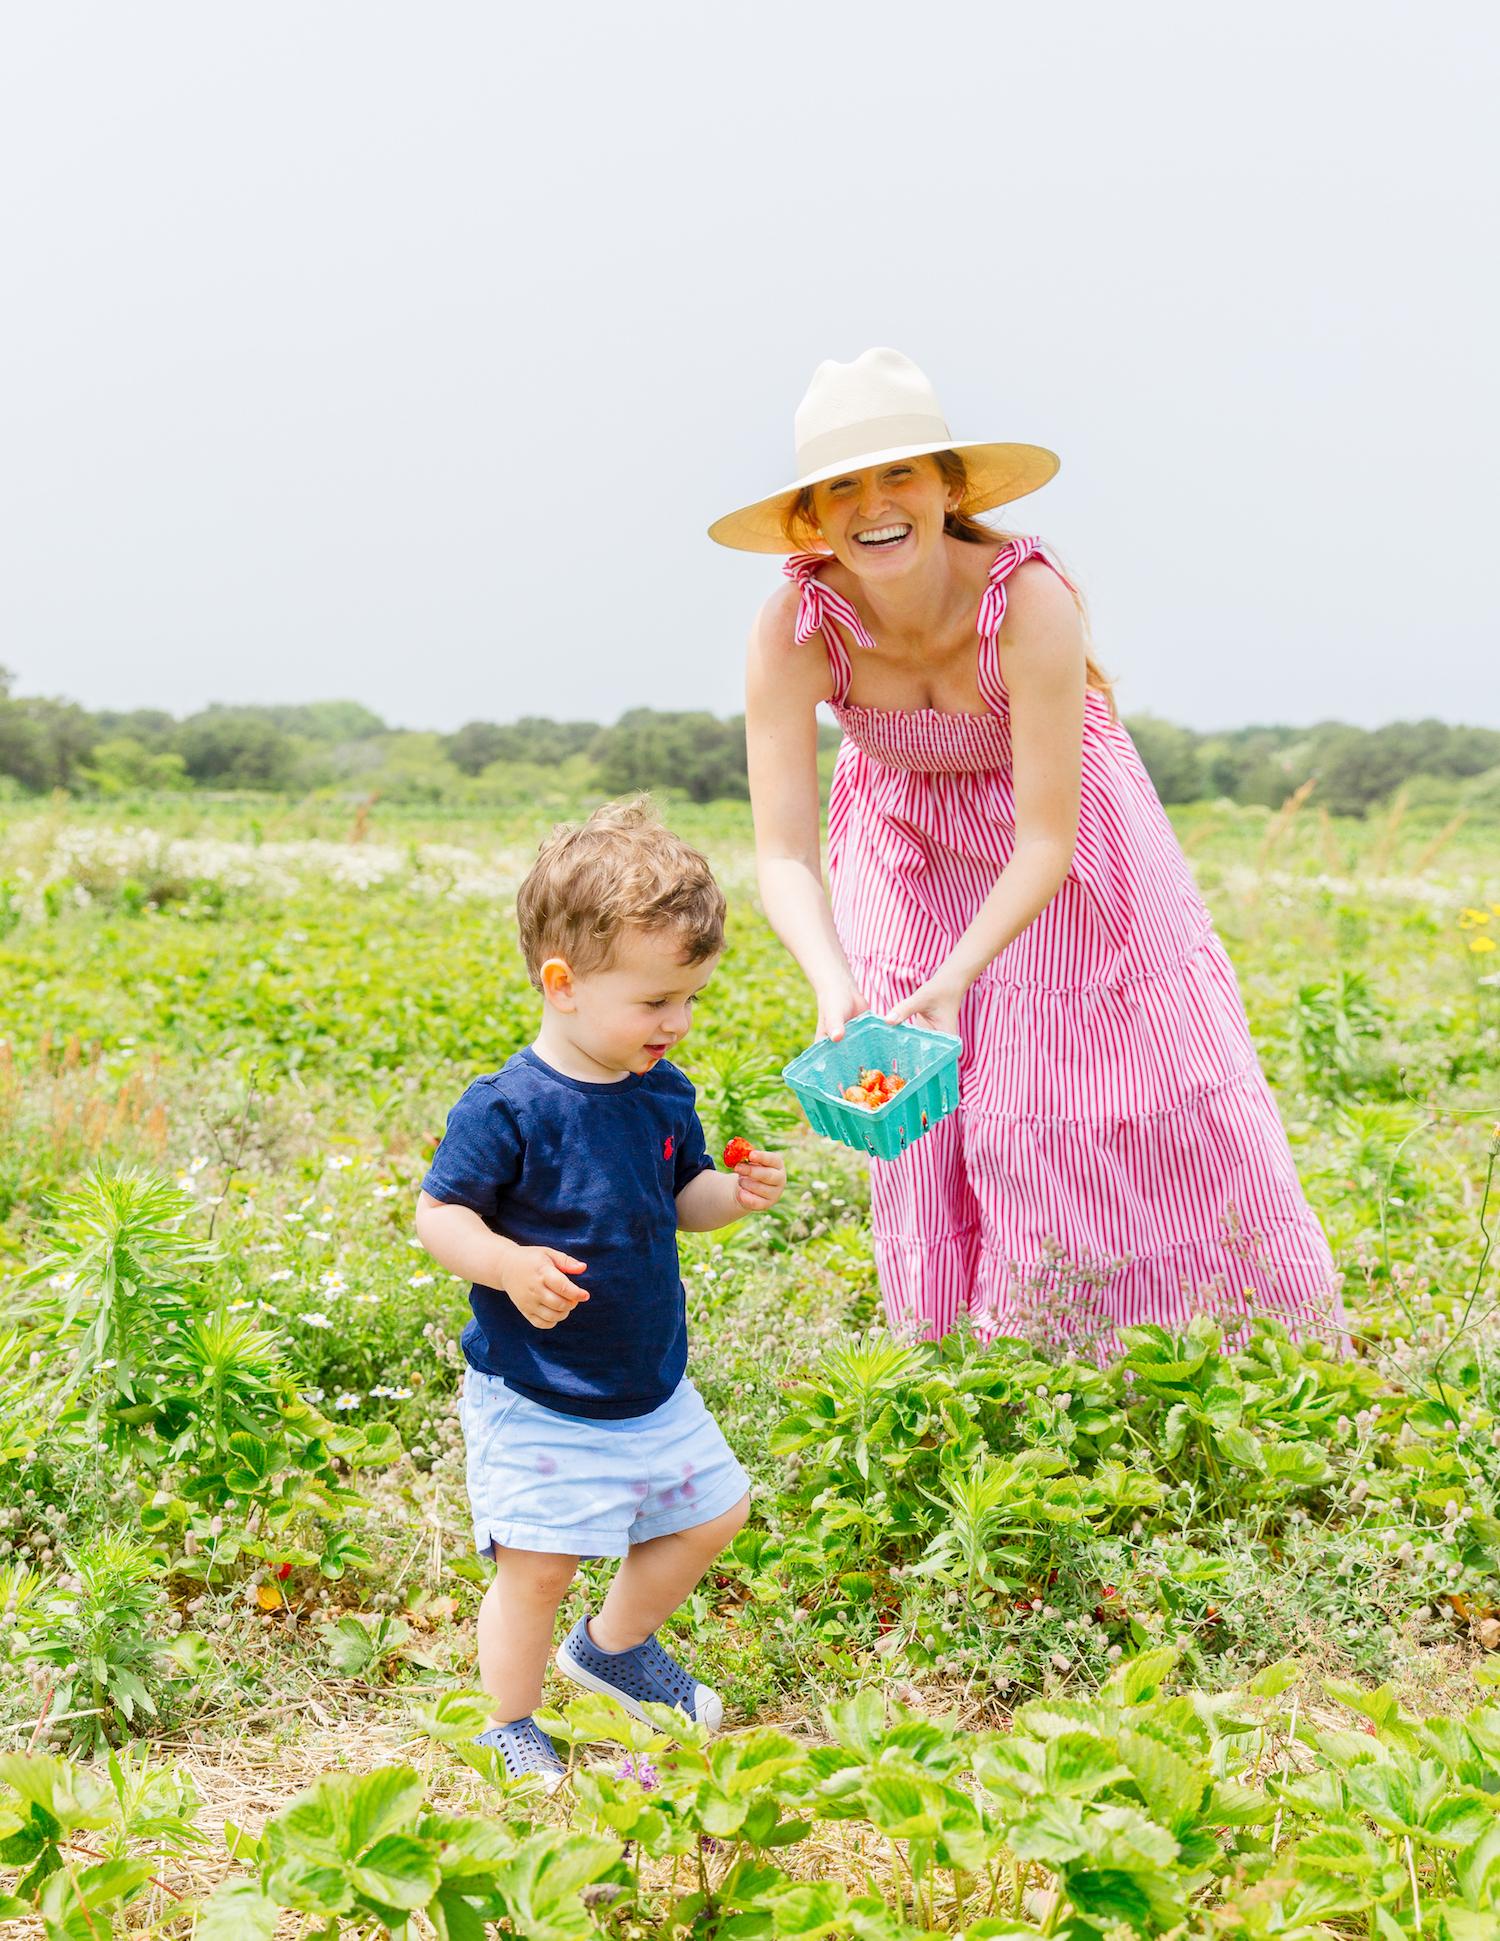 bartlett's farm strawberry picking maxwell & geraldine brooke dress in red stripe